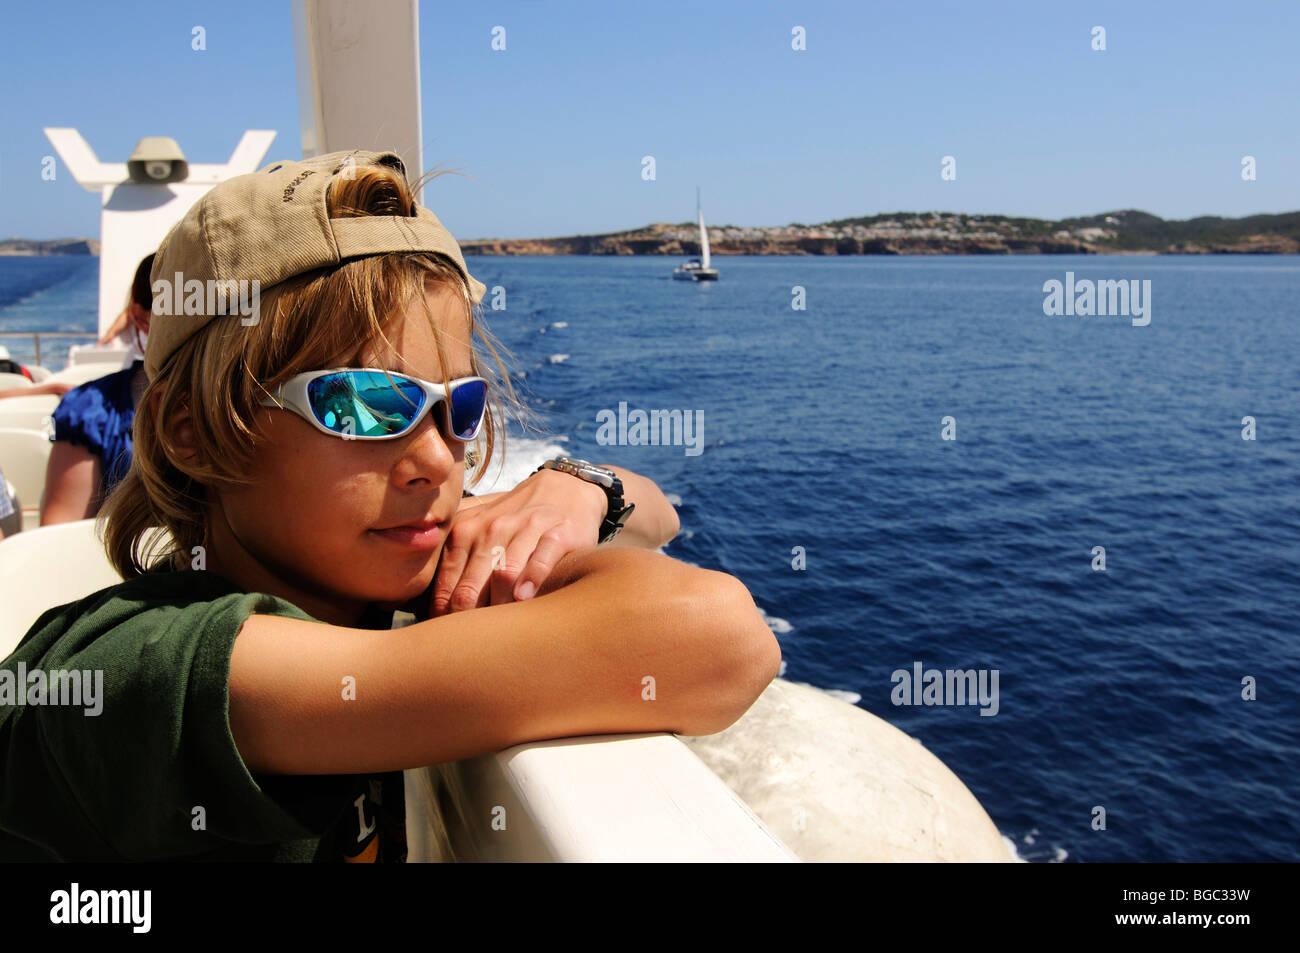 Boy on a tour boat, Ibiza, Pine Islands, Balearic Islands, Spain, Europe - Stock Image